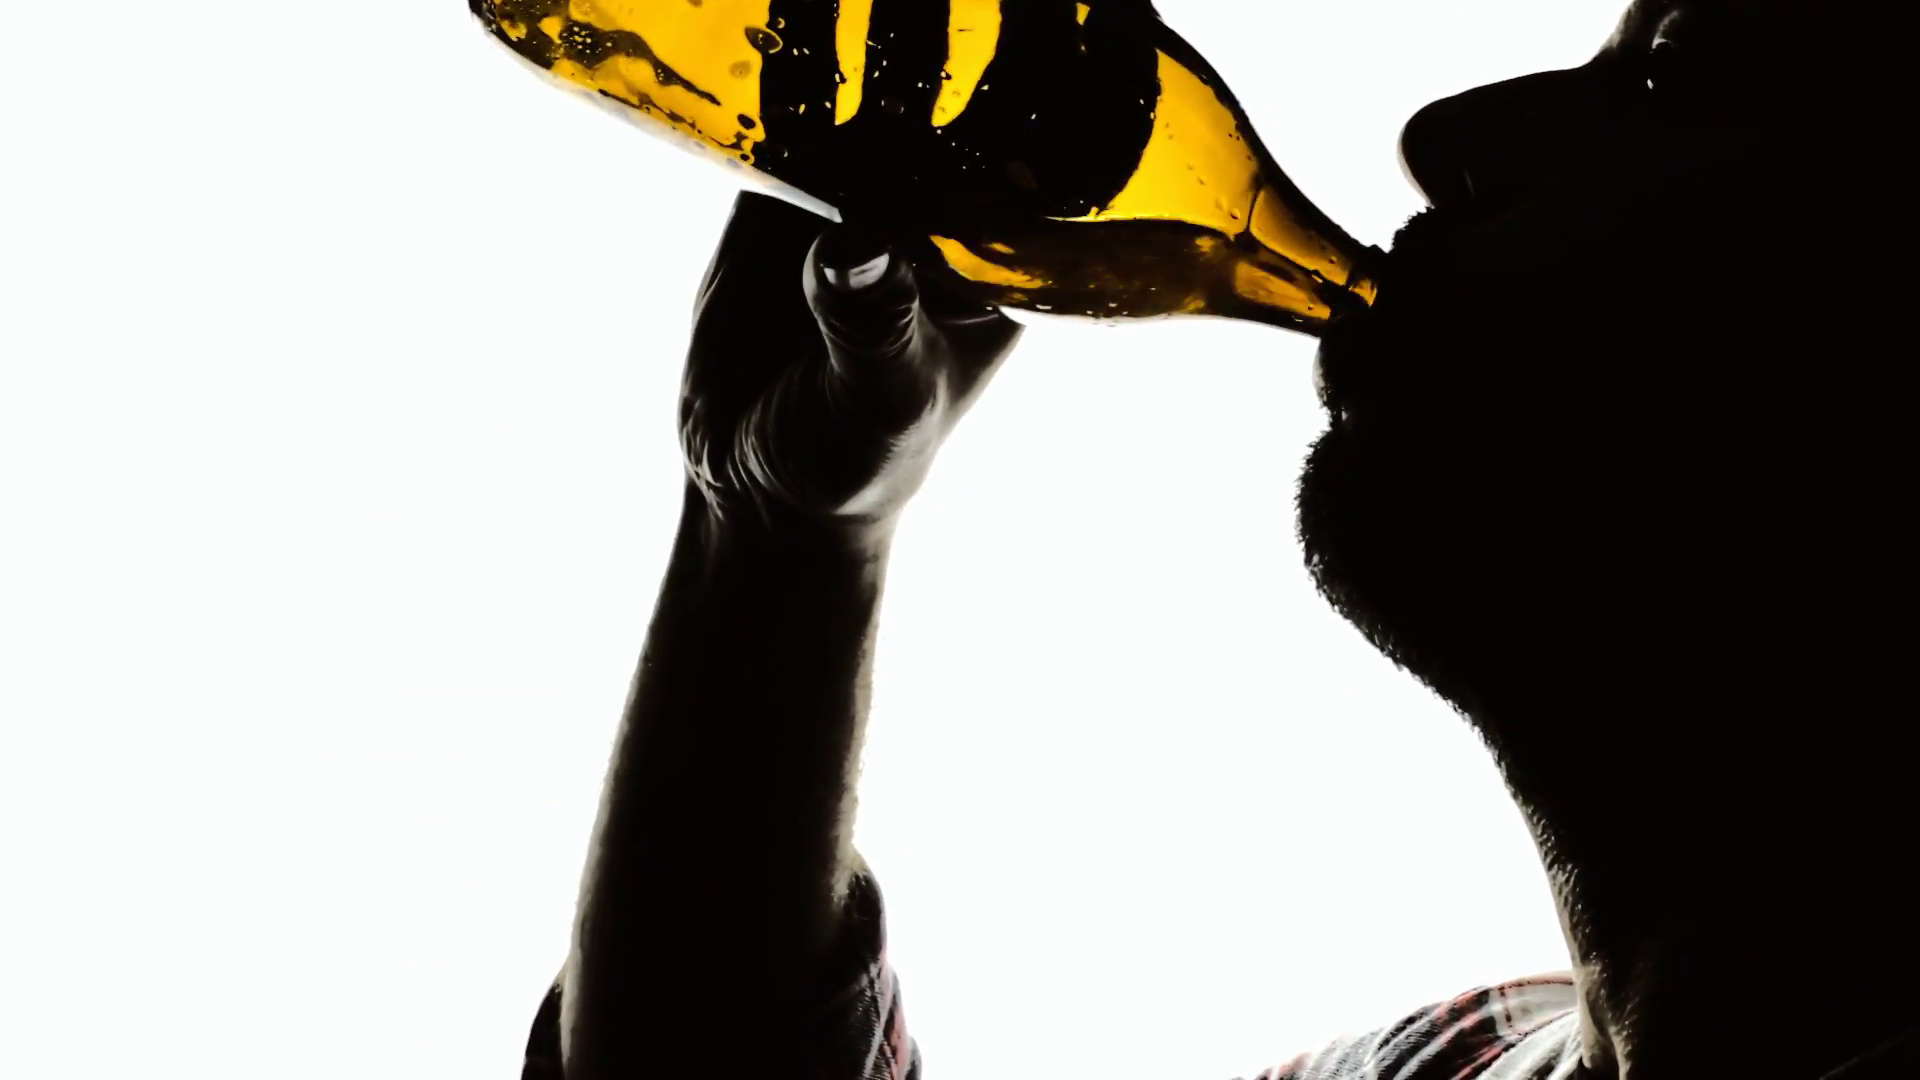 1920x1080 Silhouette Sun Man Gre Emptying Beer Bottle. A Man Drinking Beer